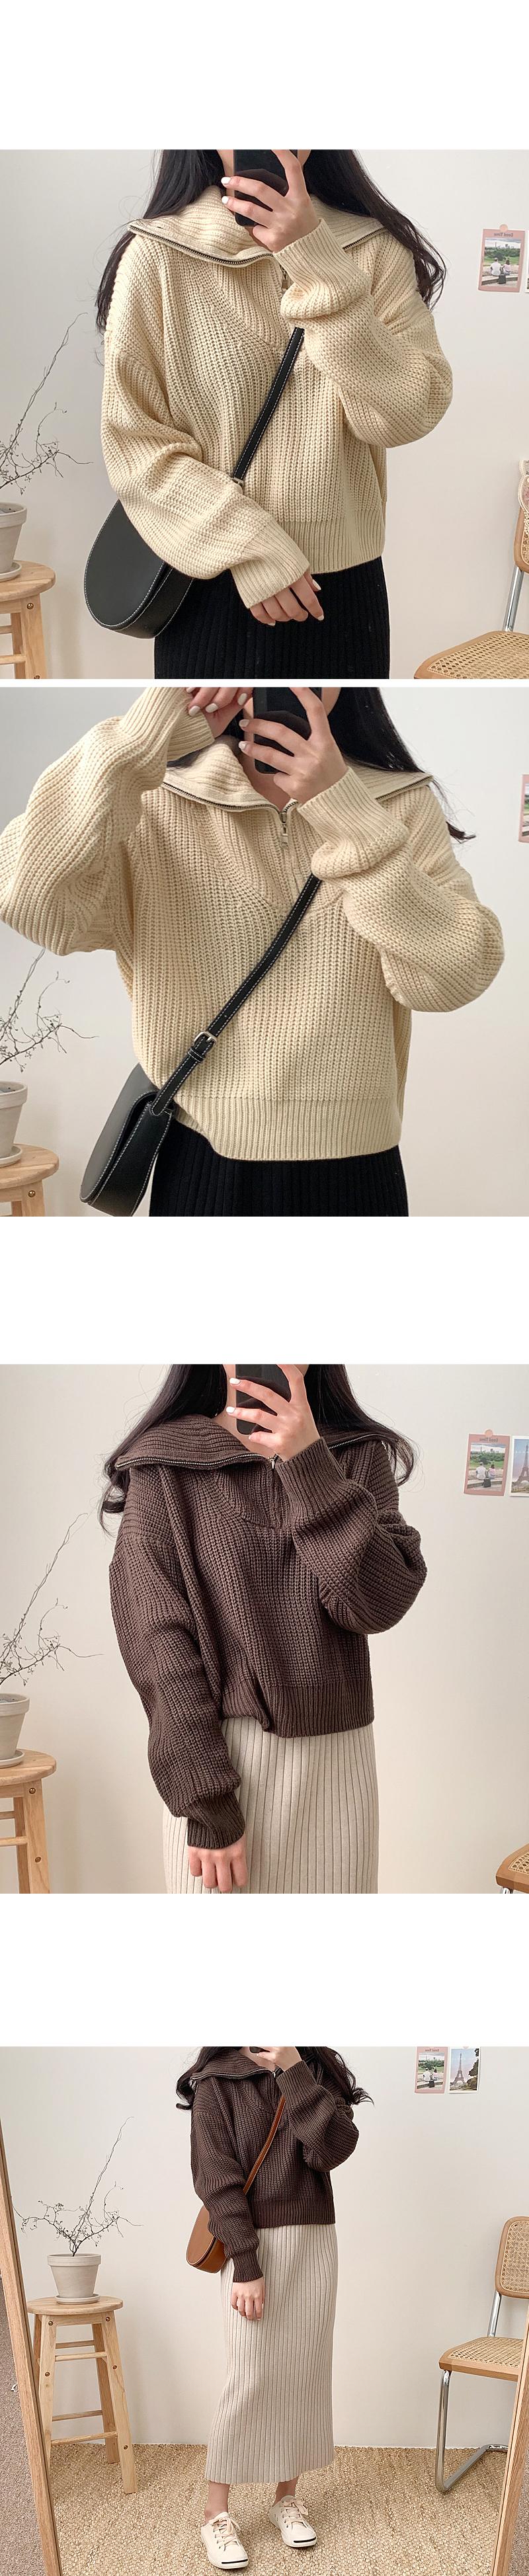 Eddie Anorak Knitwear